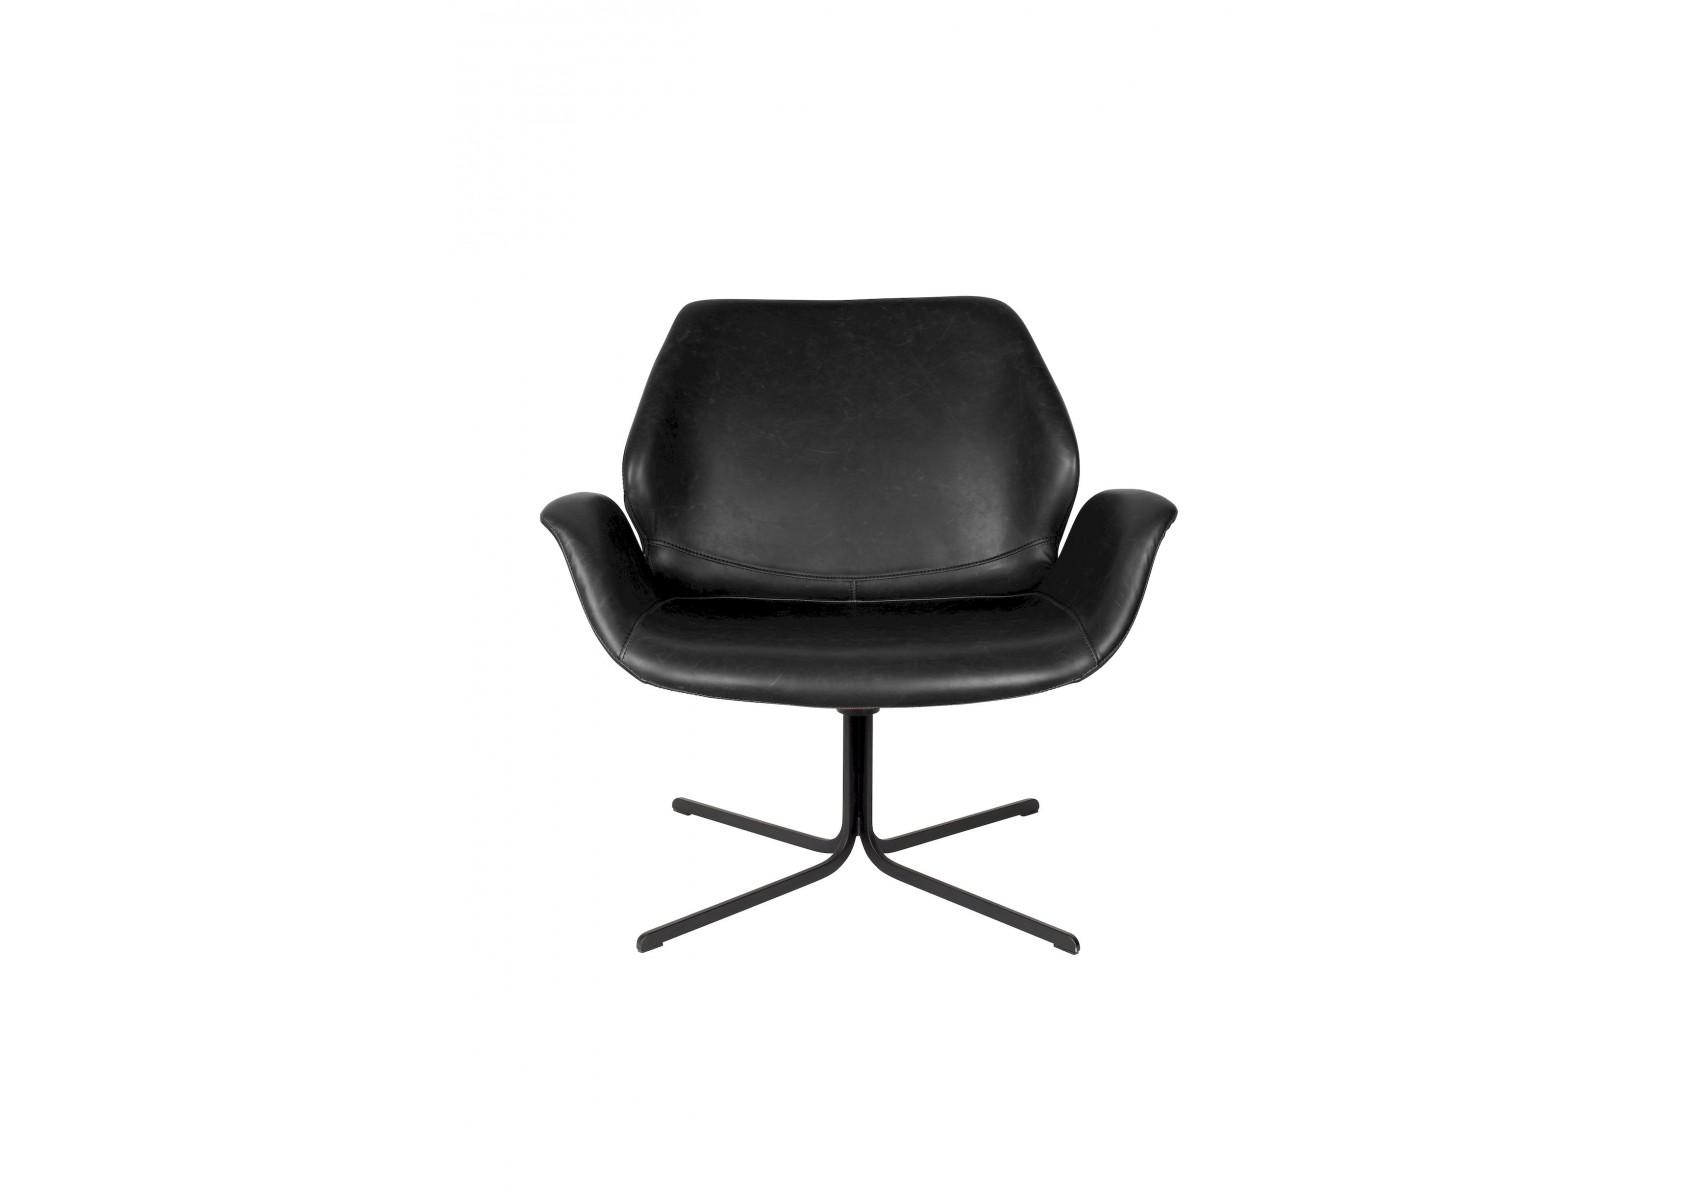 Chaise de salon pivotante nikki zuiver for Chaise zuiver